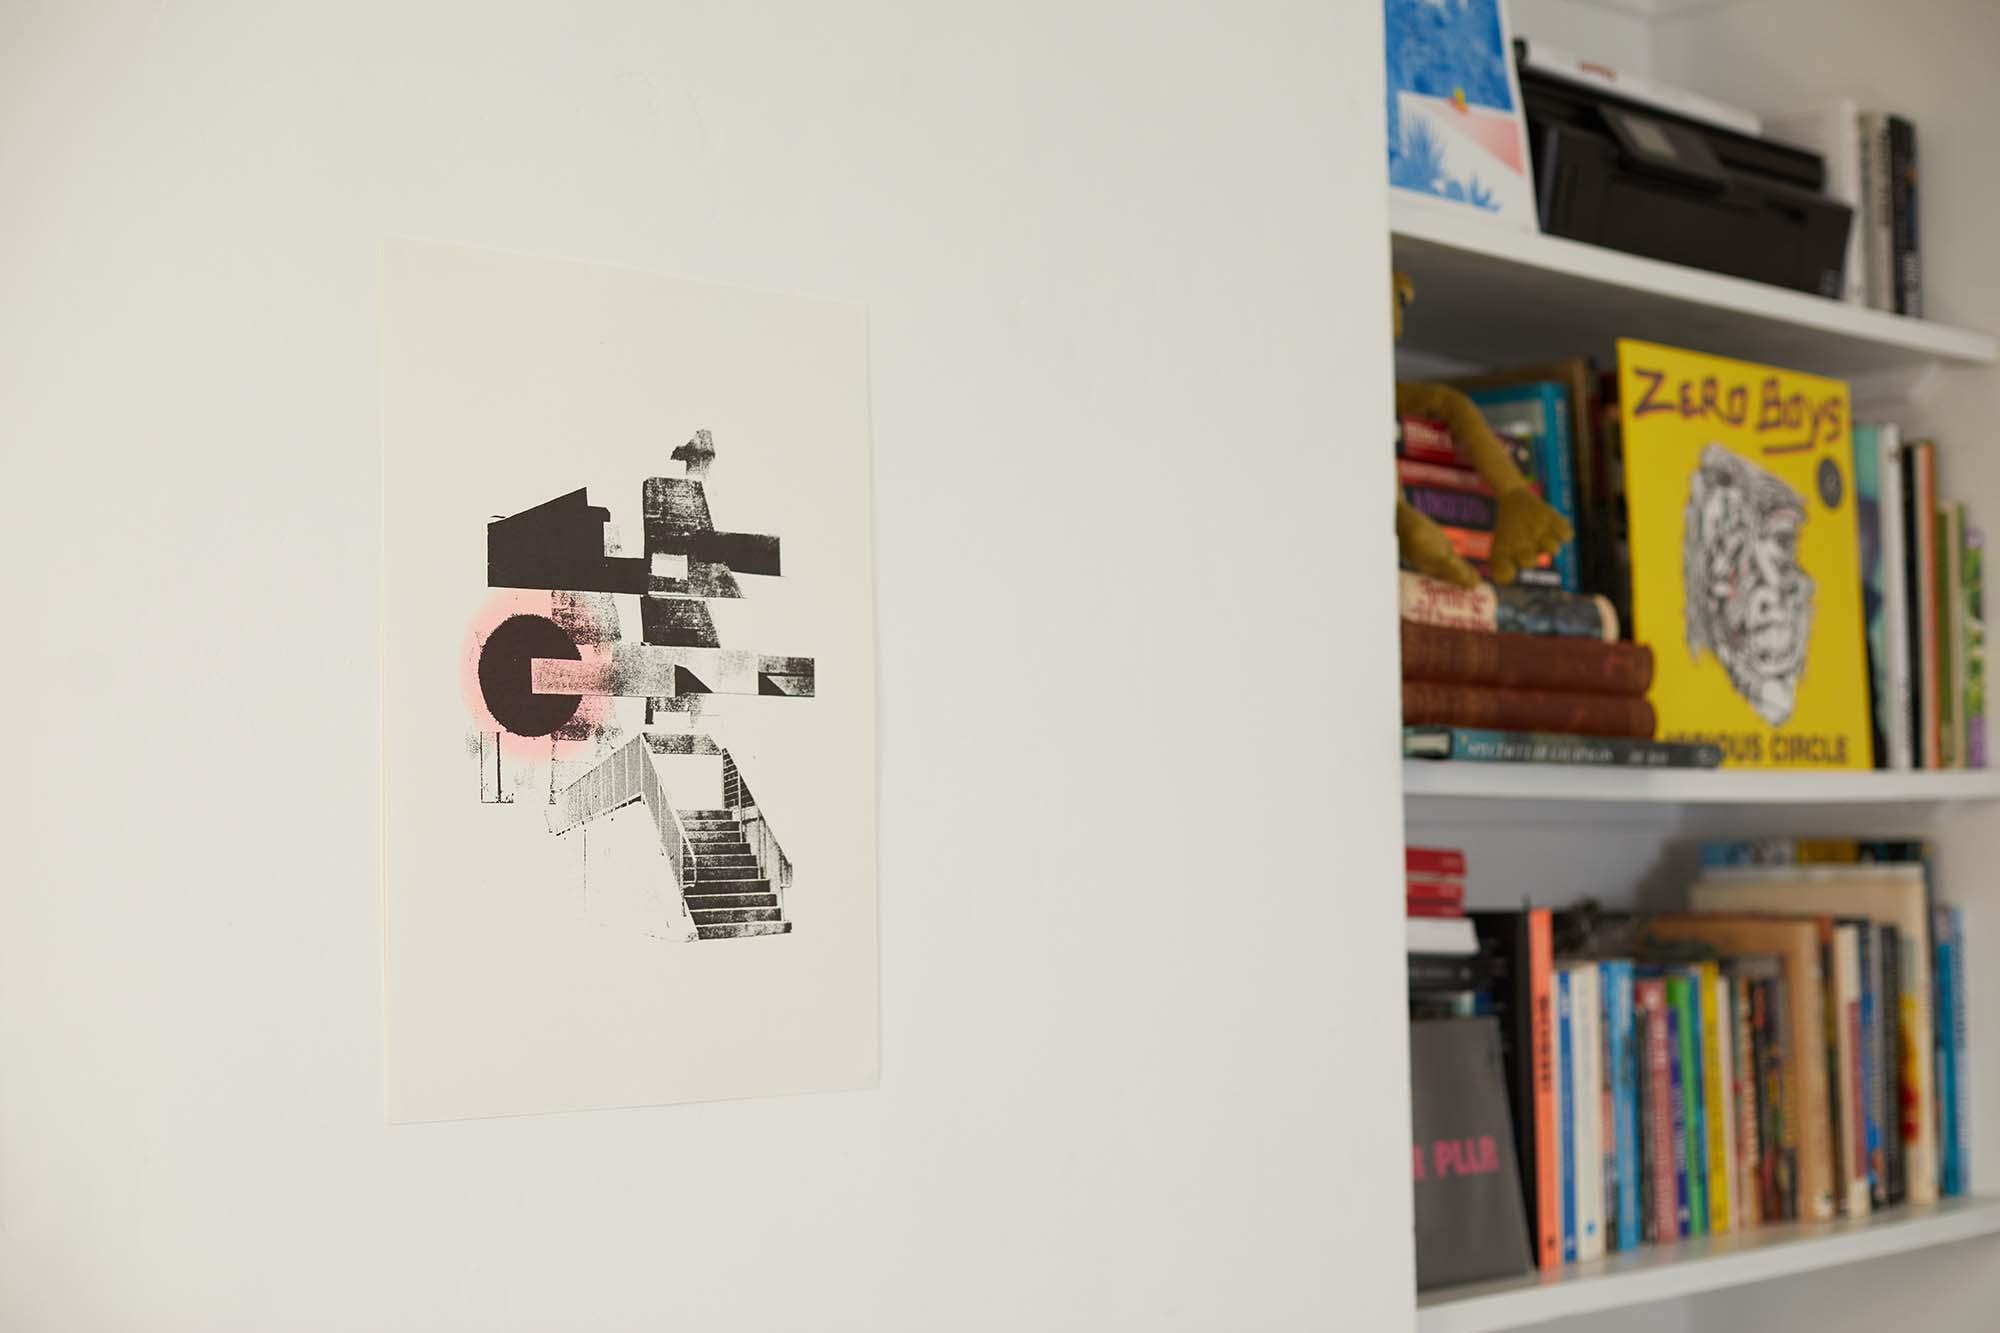 Cal Hudson print